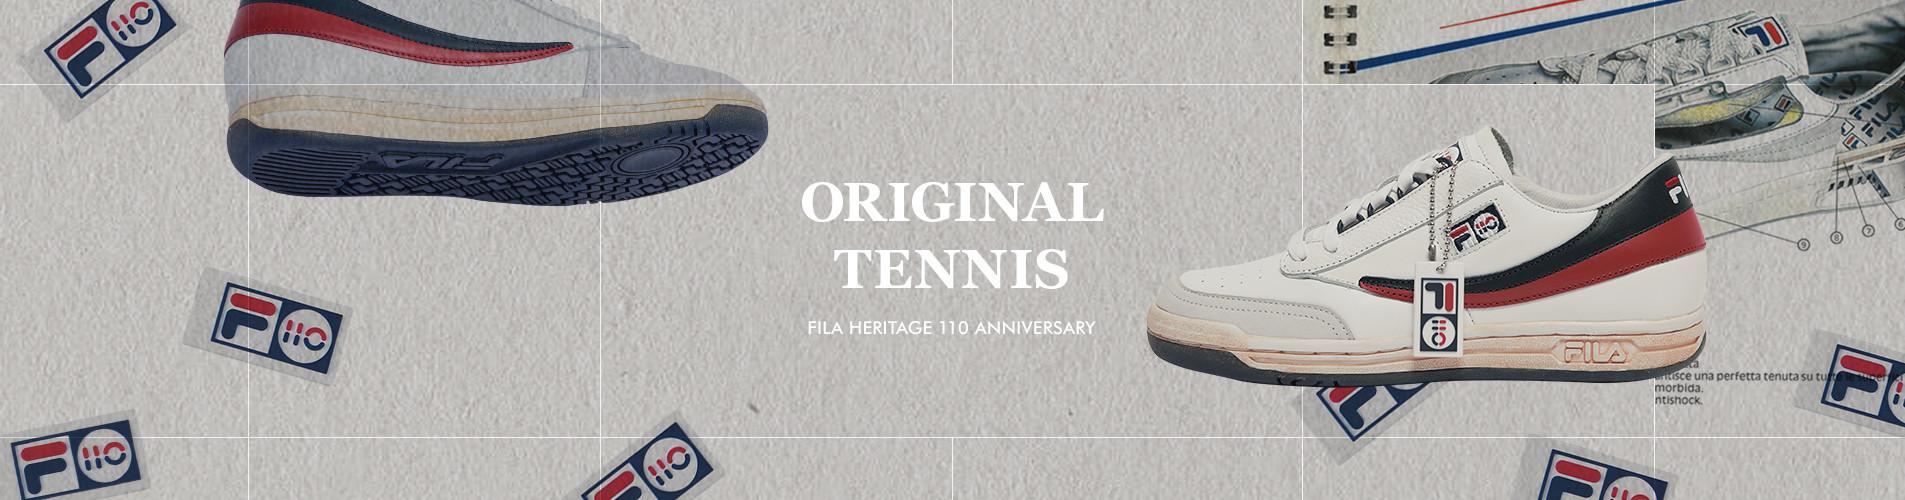 ORIGINAL TENNIS